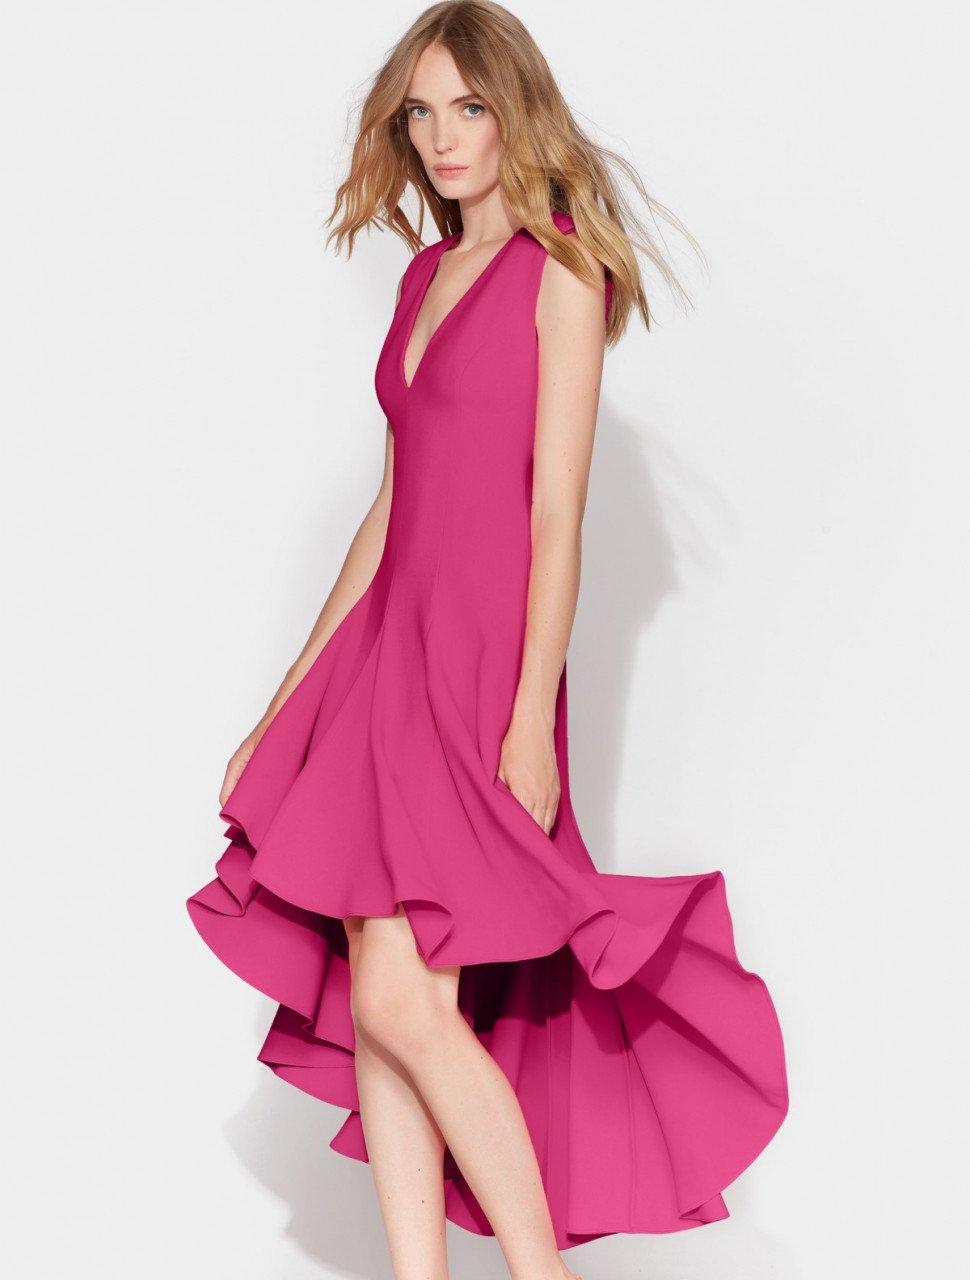 FLOWY HI LO CREPE DRESS